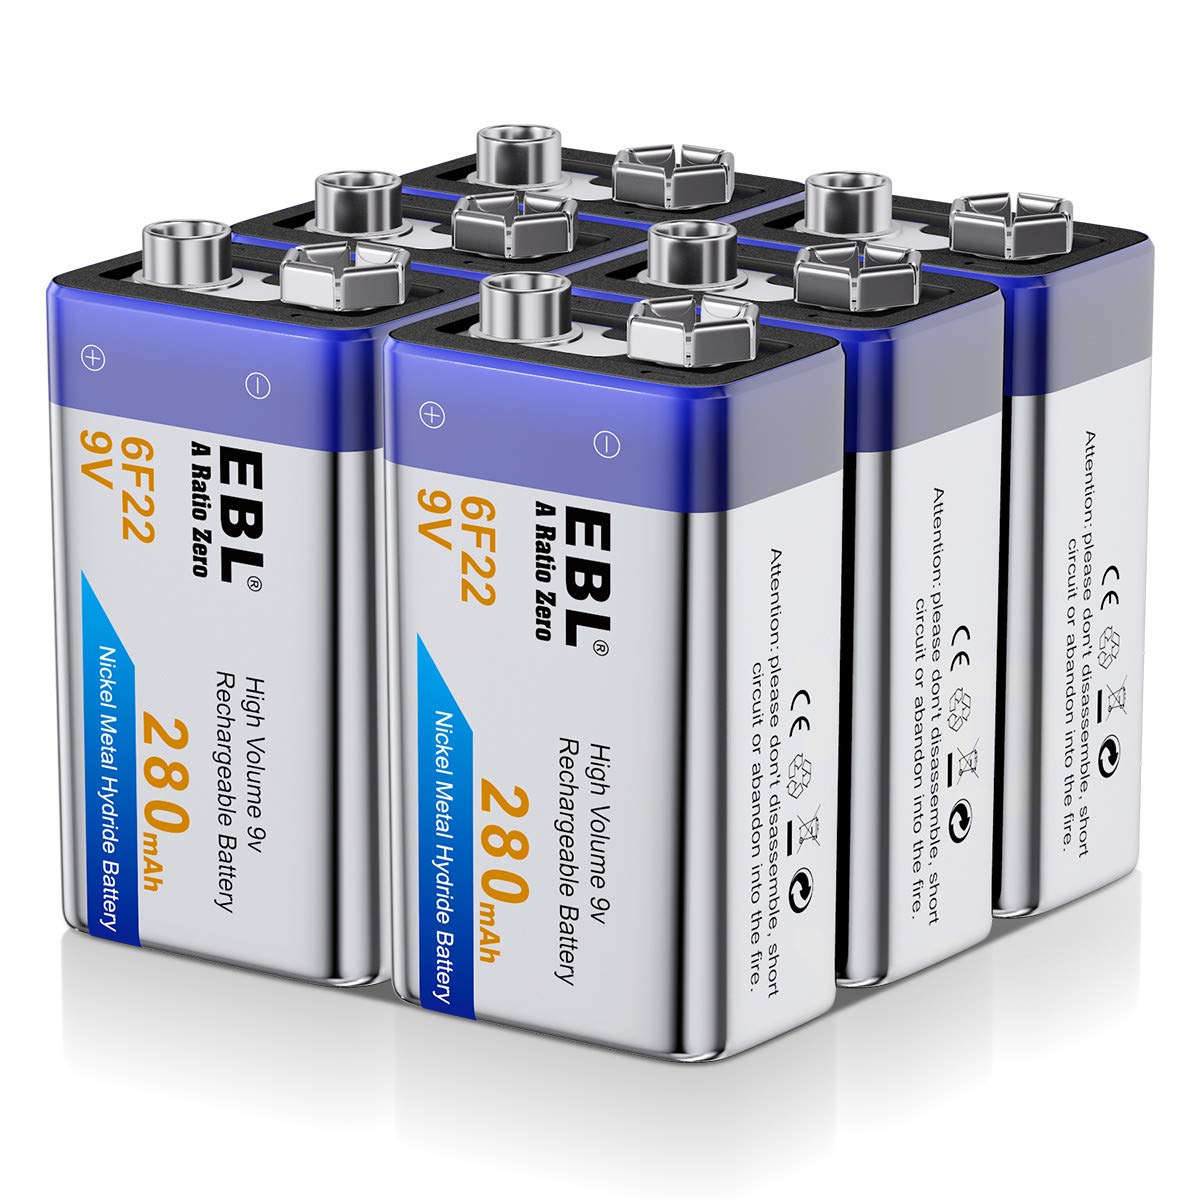 EBL 9 Volt Rechargeable 9V Batteries, 6 Packs 280mAh Ni-MH